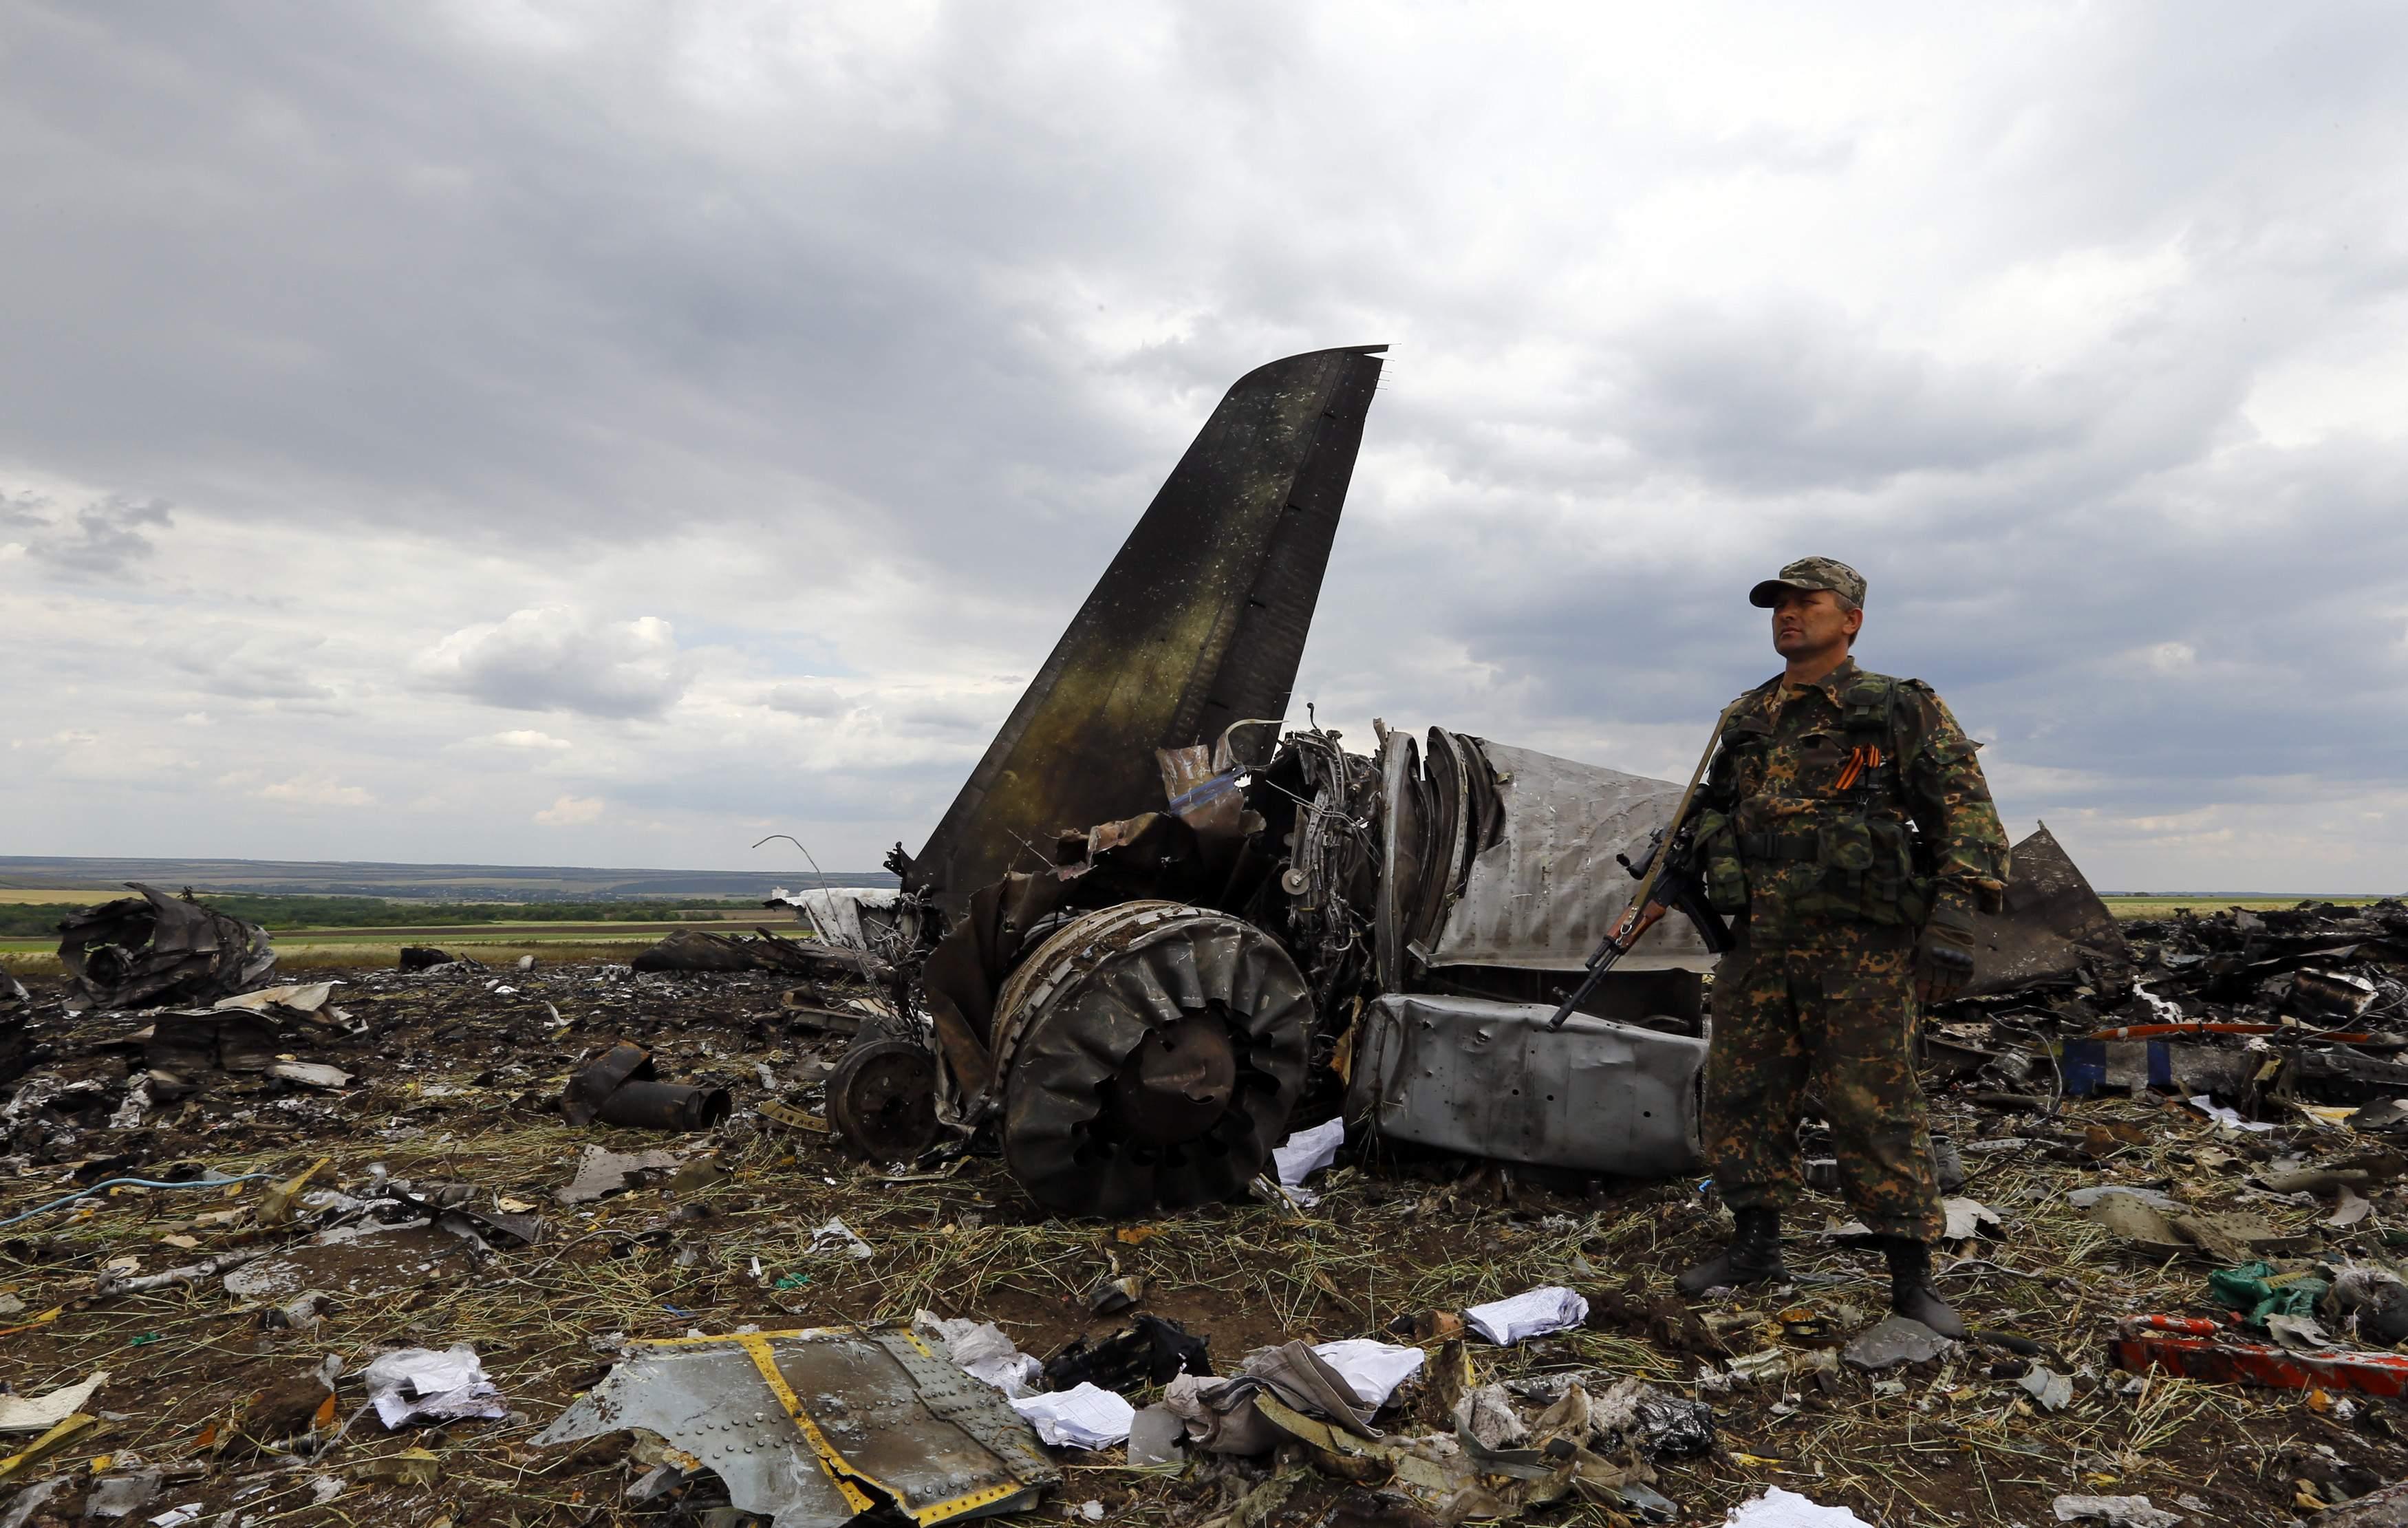 Обломки сбитого украинского транспортника